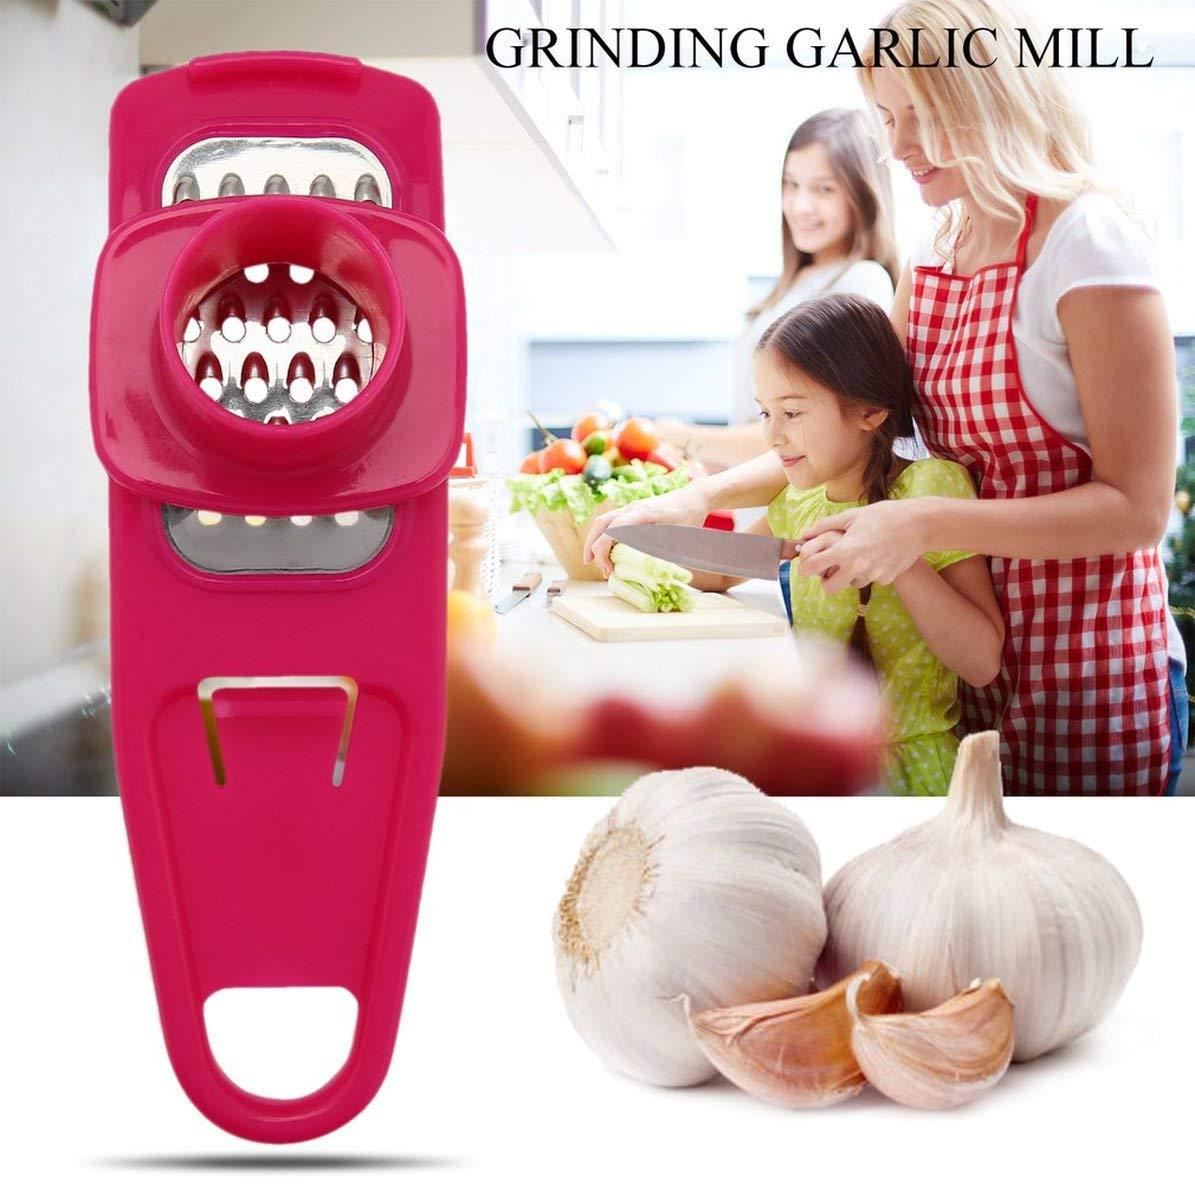 Household Grinding Garlic Mill Multifunction Ginger Garlic Crusher Portable Garlic Press Device Kitchen Accessories